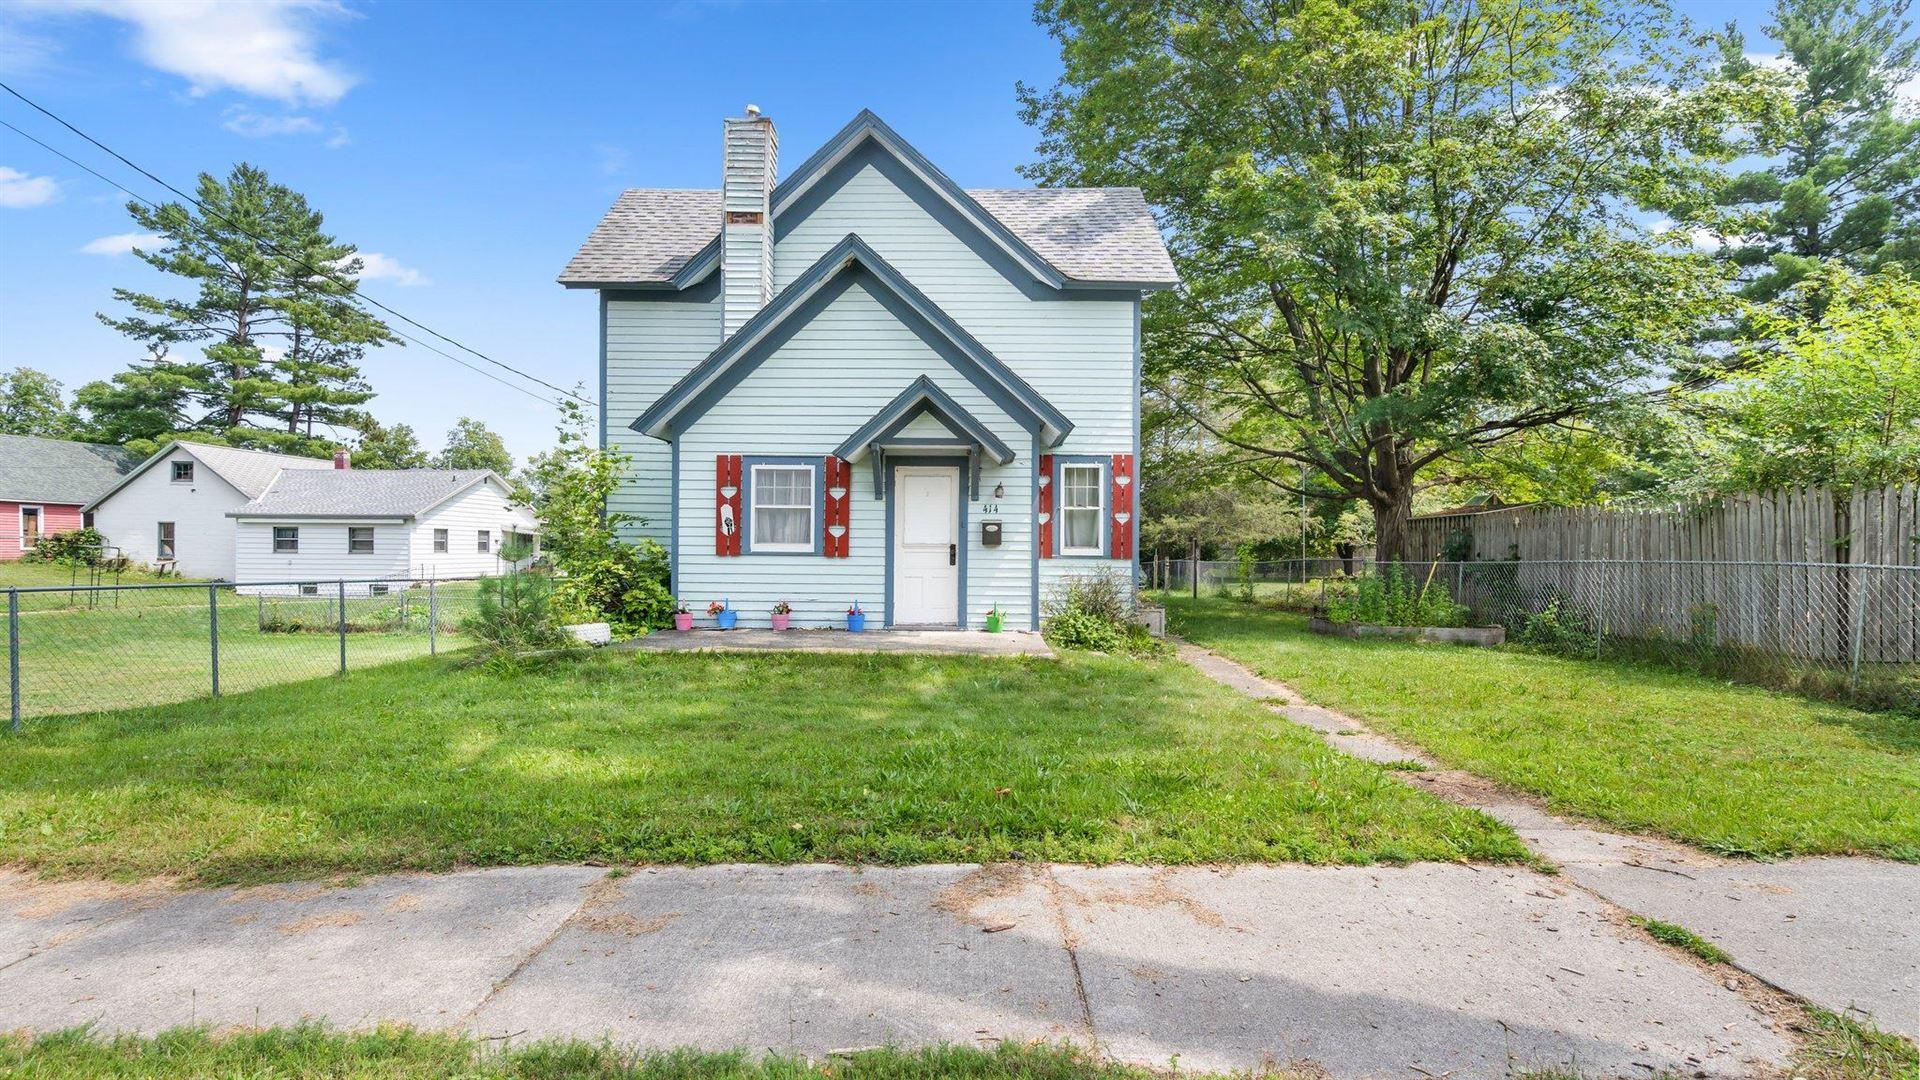 414 Marion Avenue, Big Rapids, MI 49307 - MLS#: 21099483